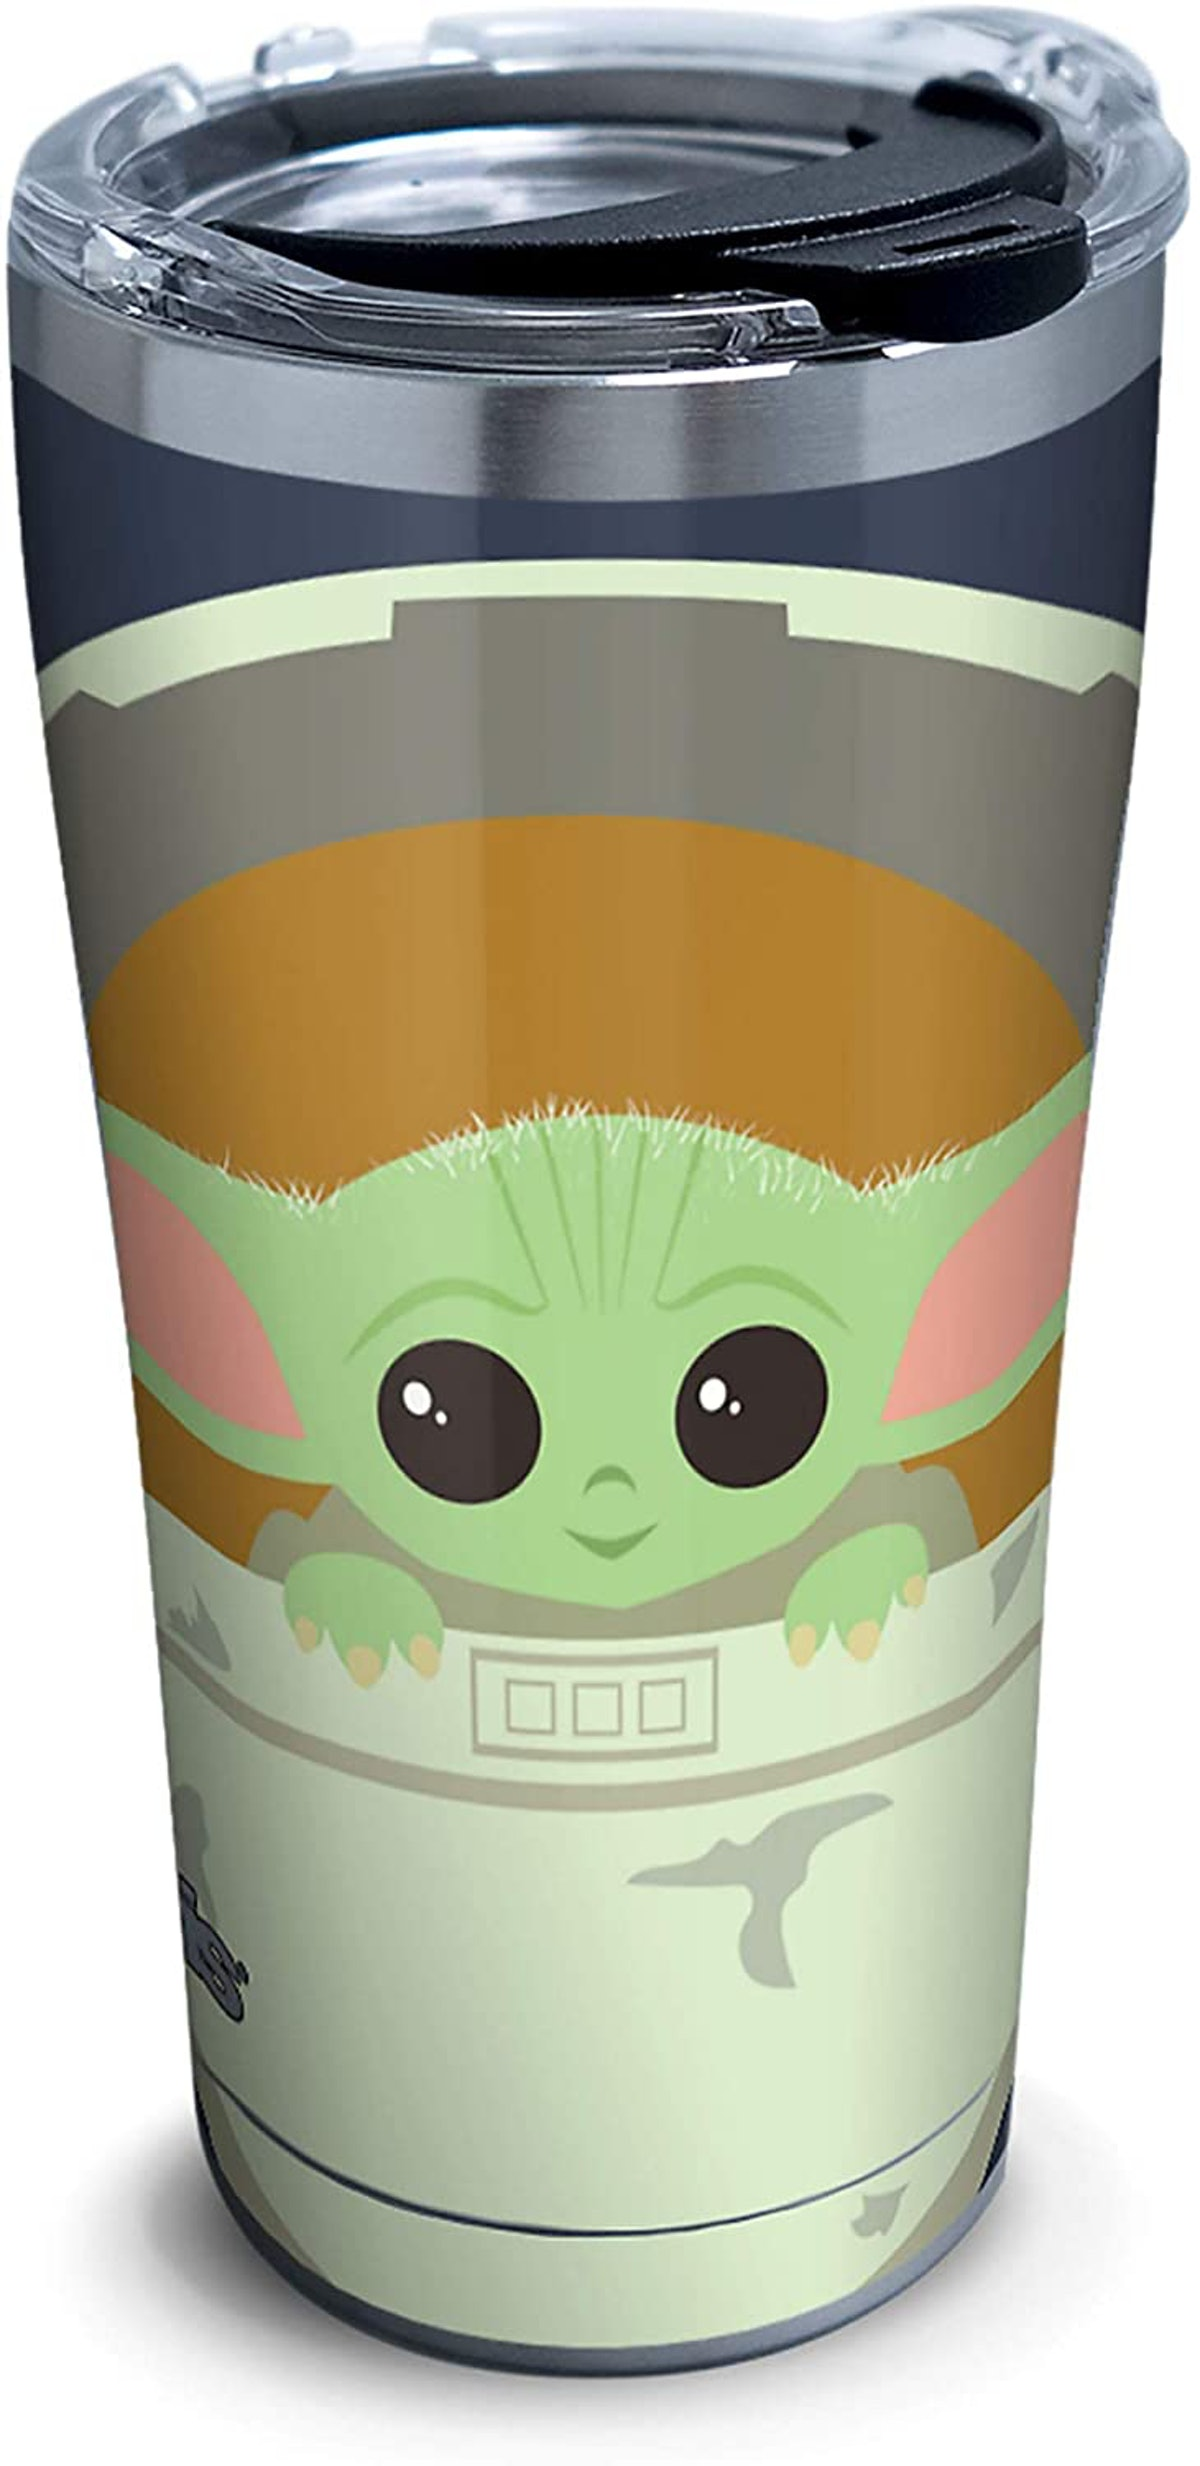 Tervis Star Wars - The Mandalorian Insulated Tumbler (20 oz.)